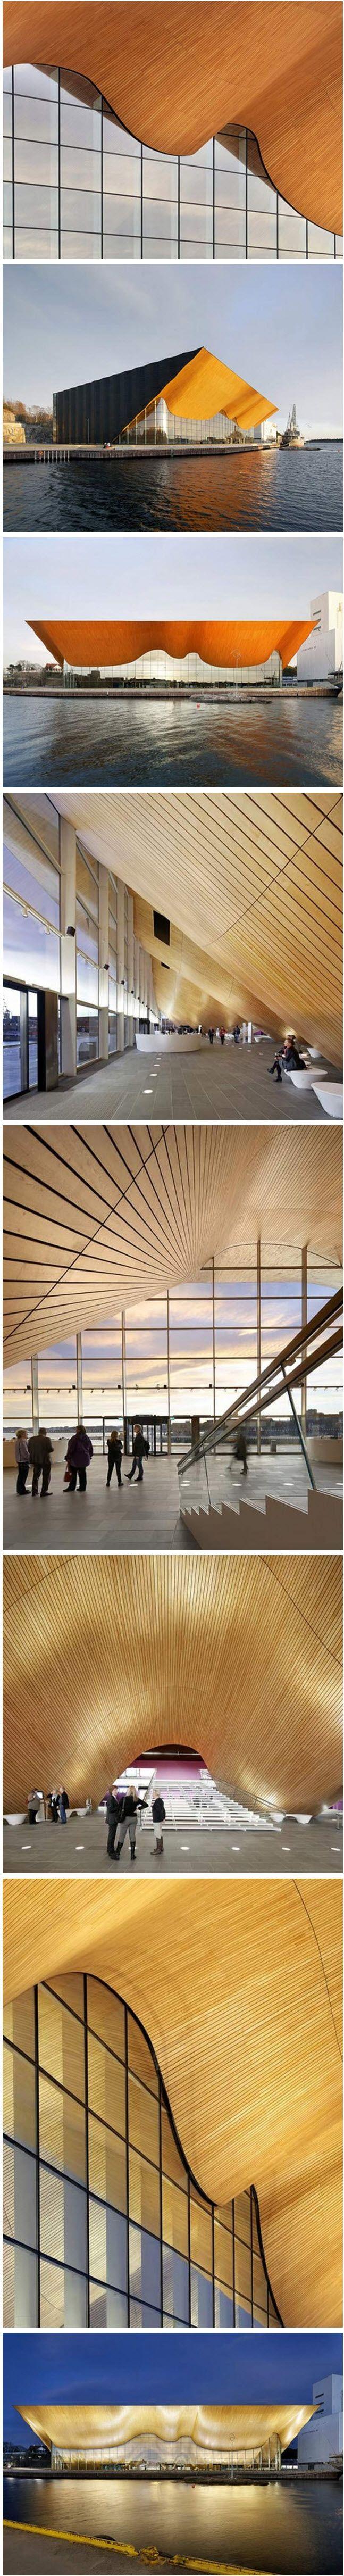 Jansen VISS Ixtra Steel Façade at Kilden PEERFORMING ARTS Centre, Kristiansand…